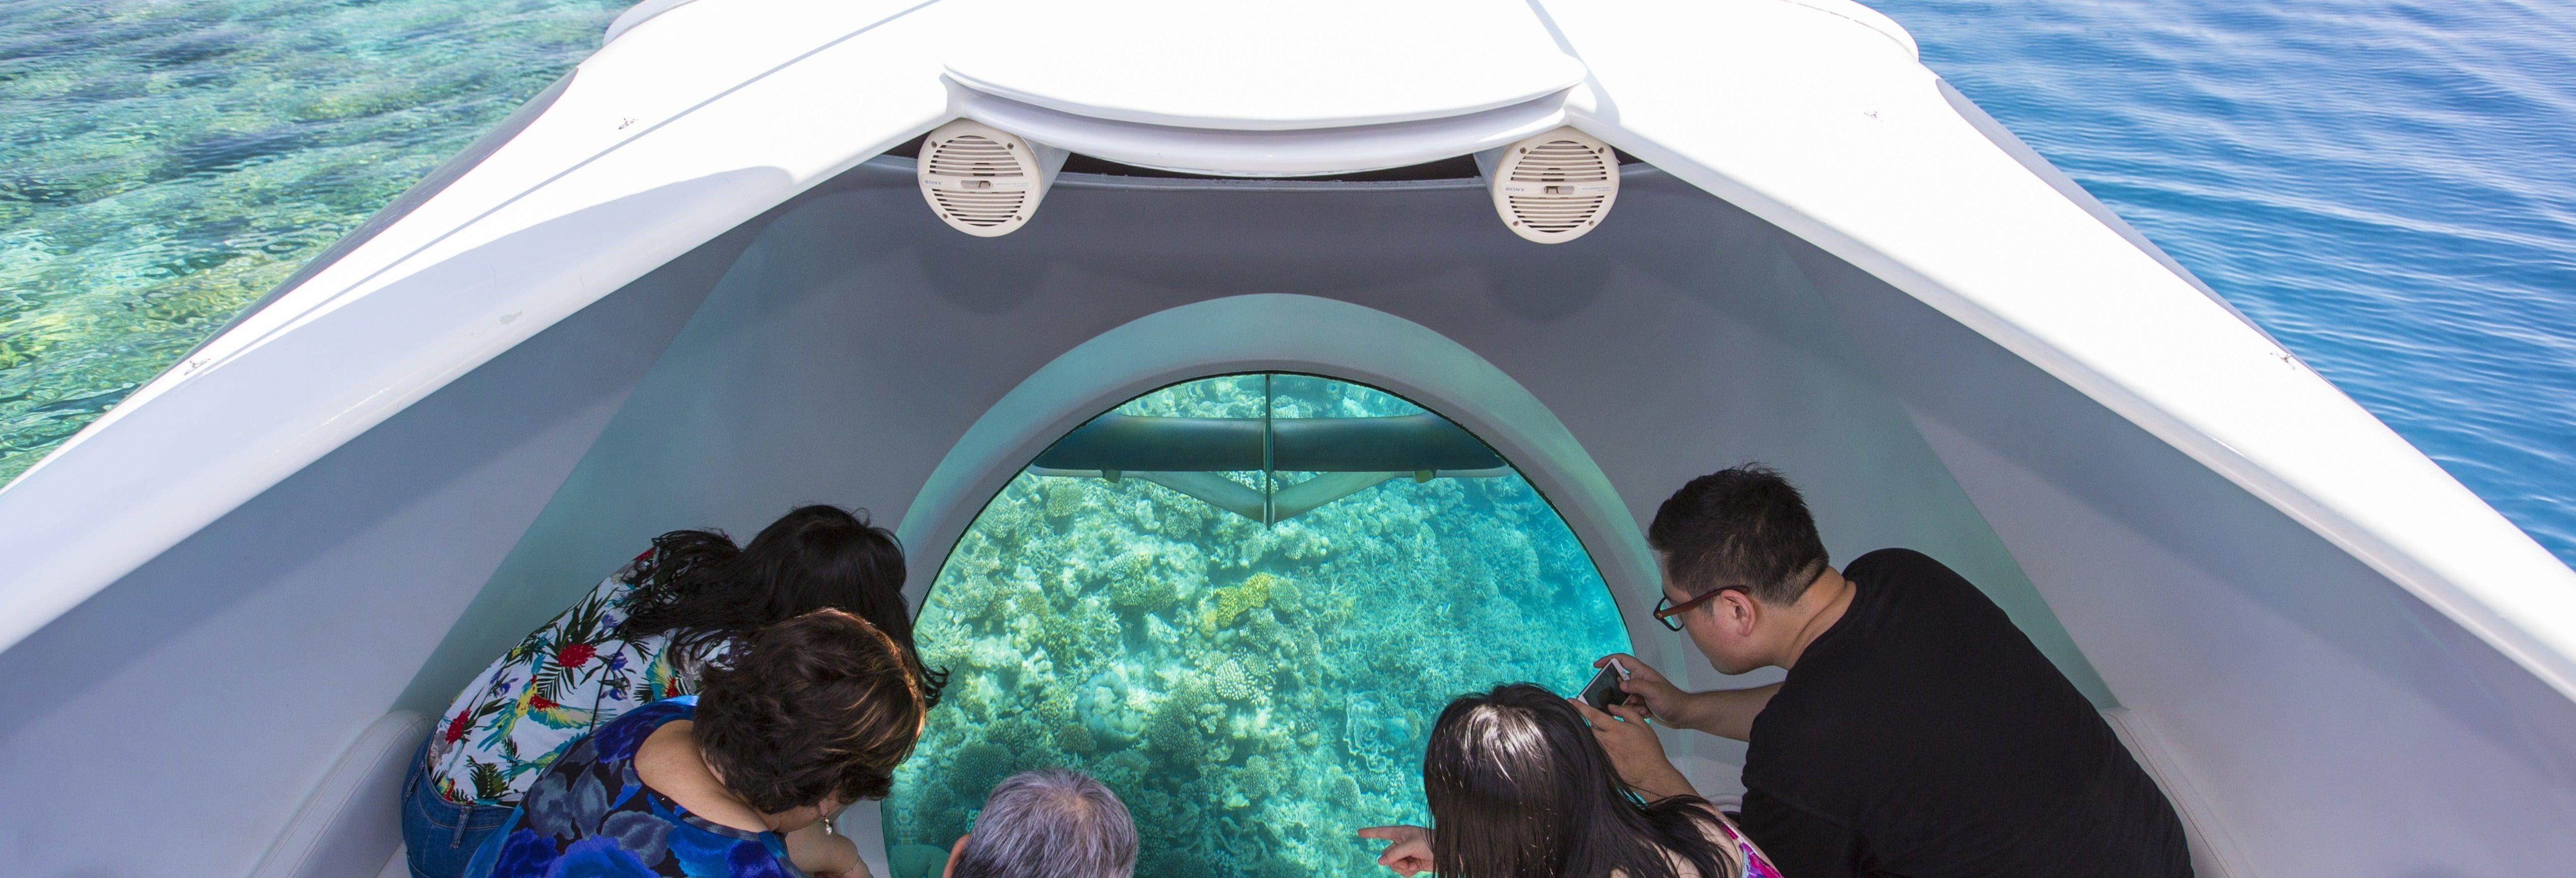 Balade en bateau à fond de verre